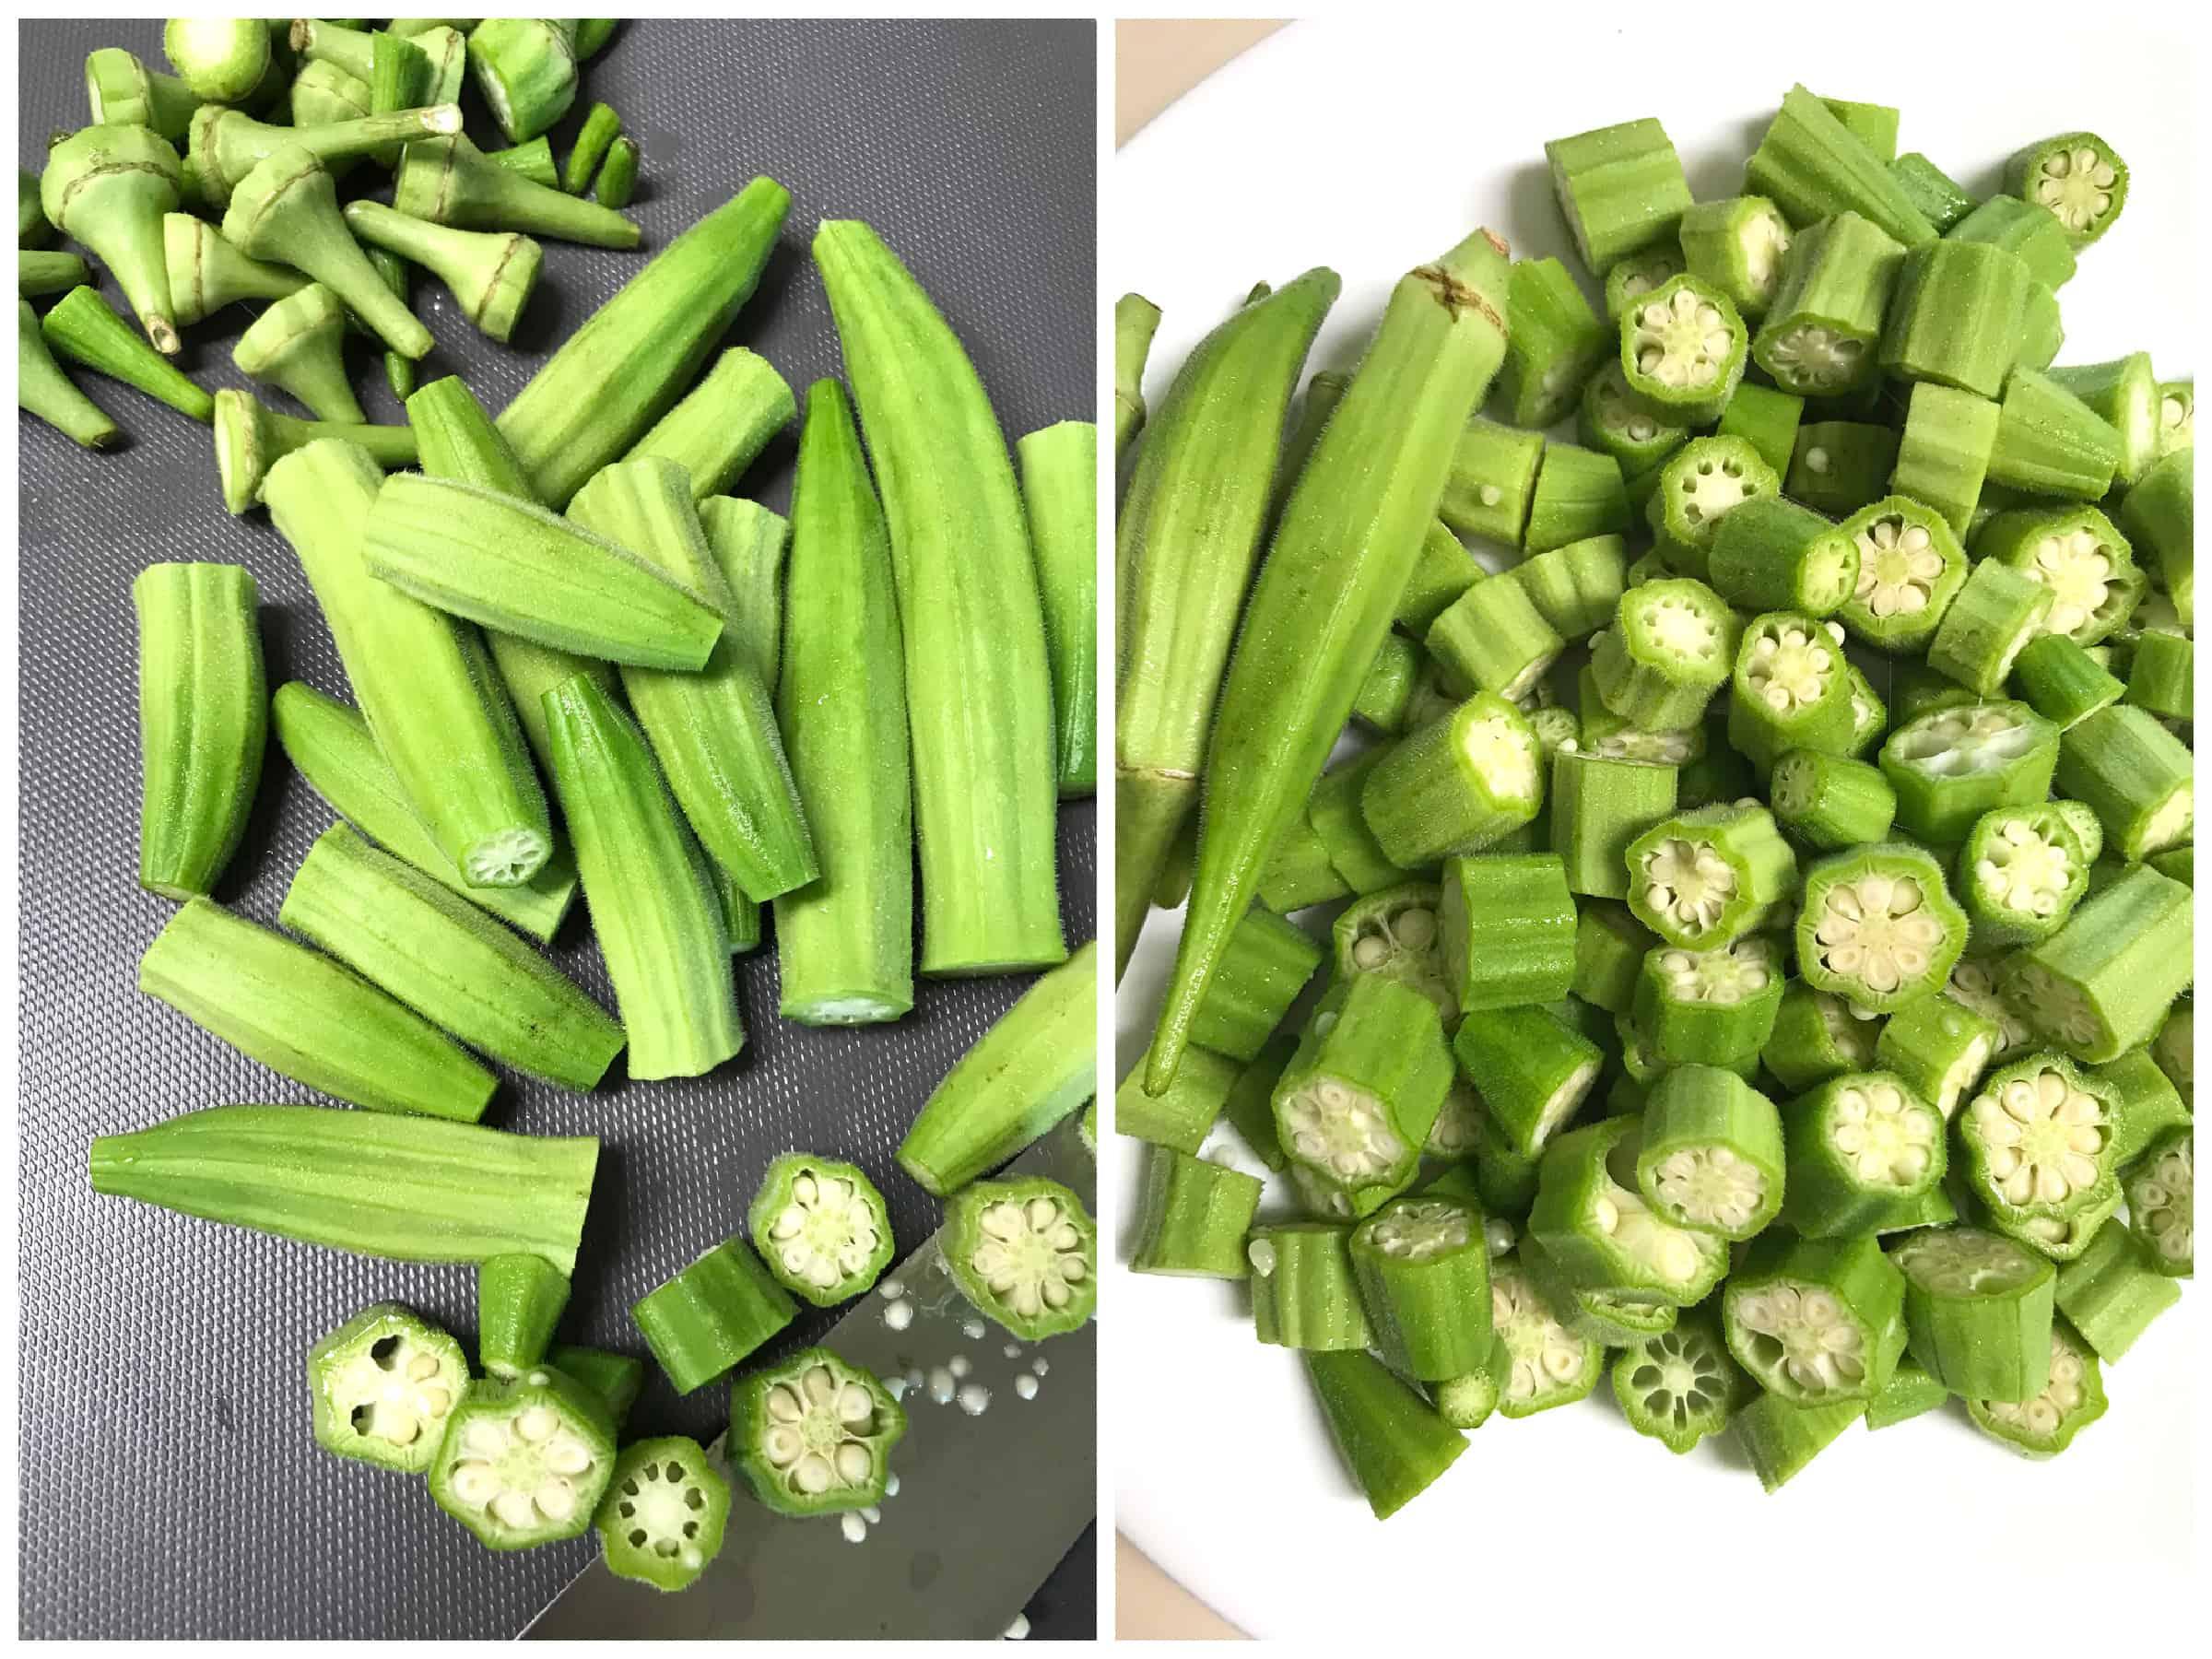 slicing veggies